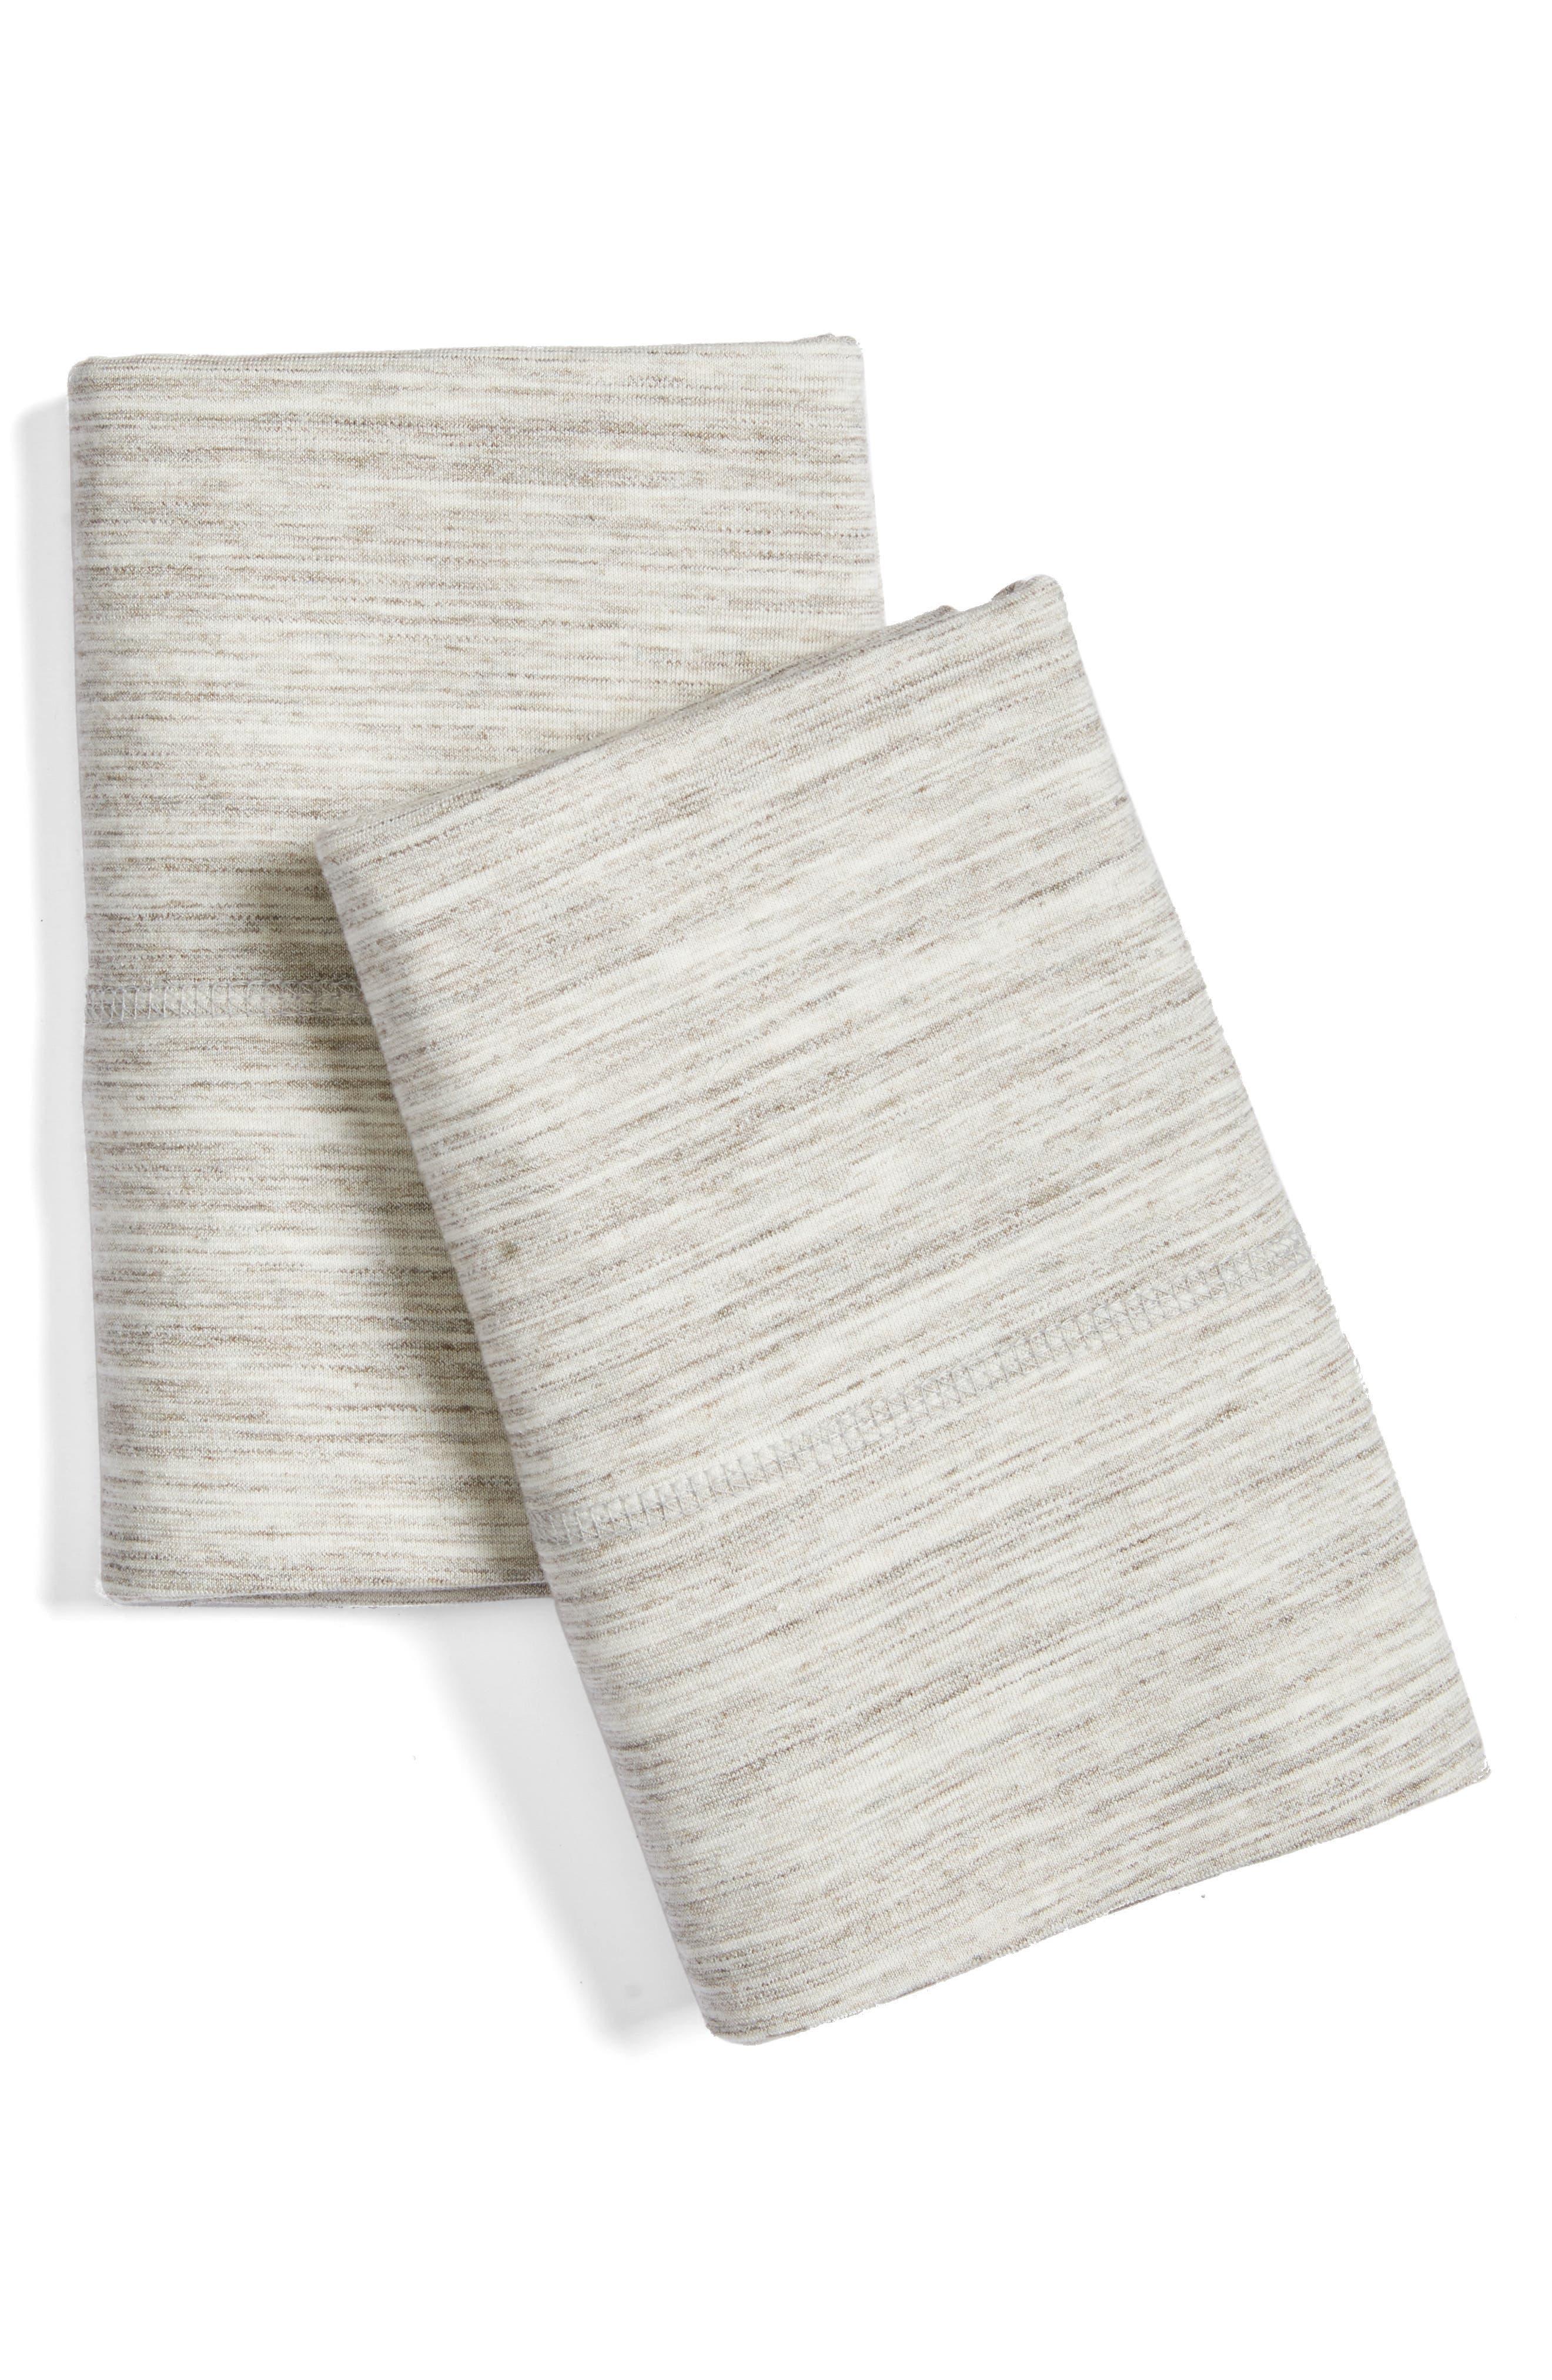 Strata Pillowcases,                         Main,                         color, 250